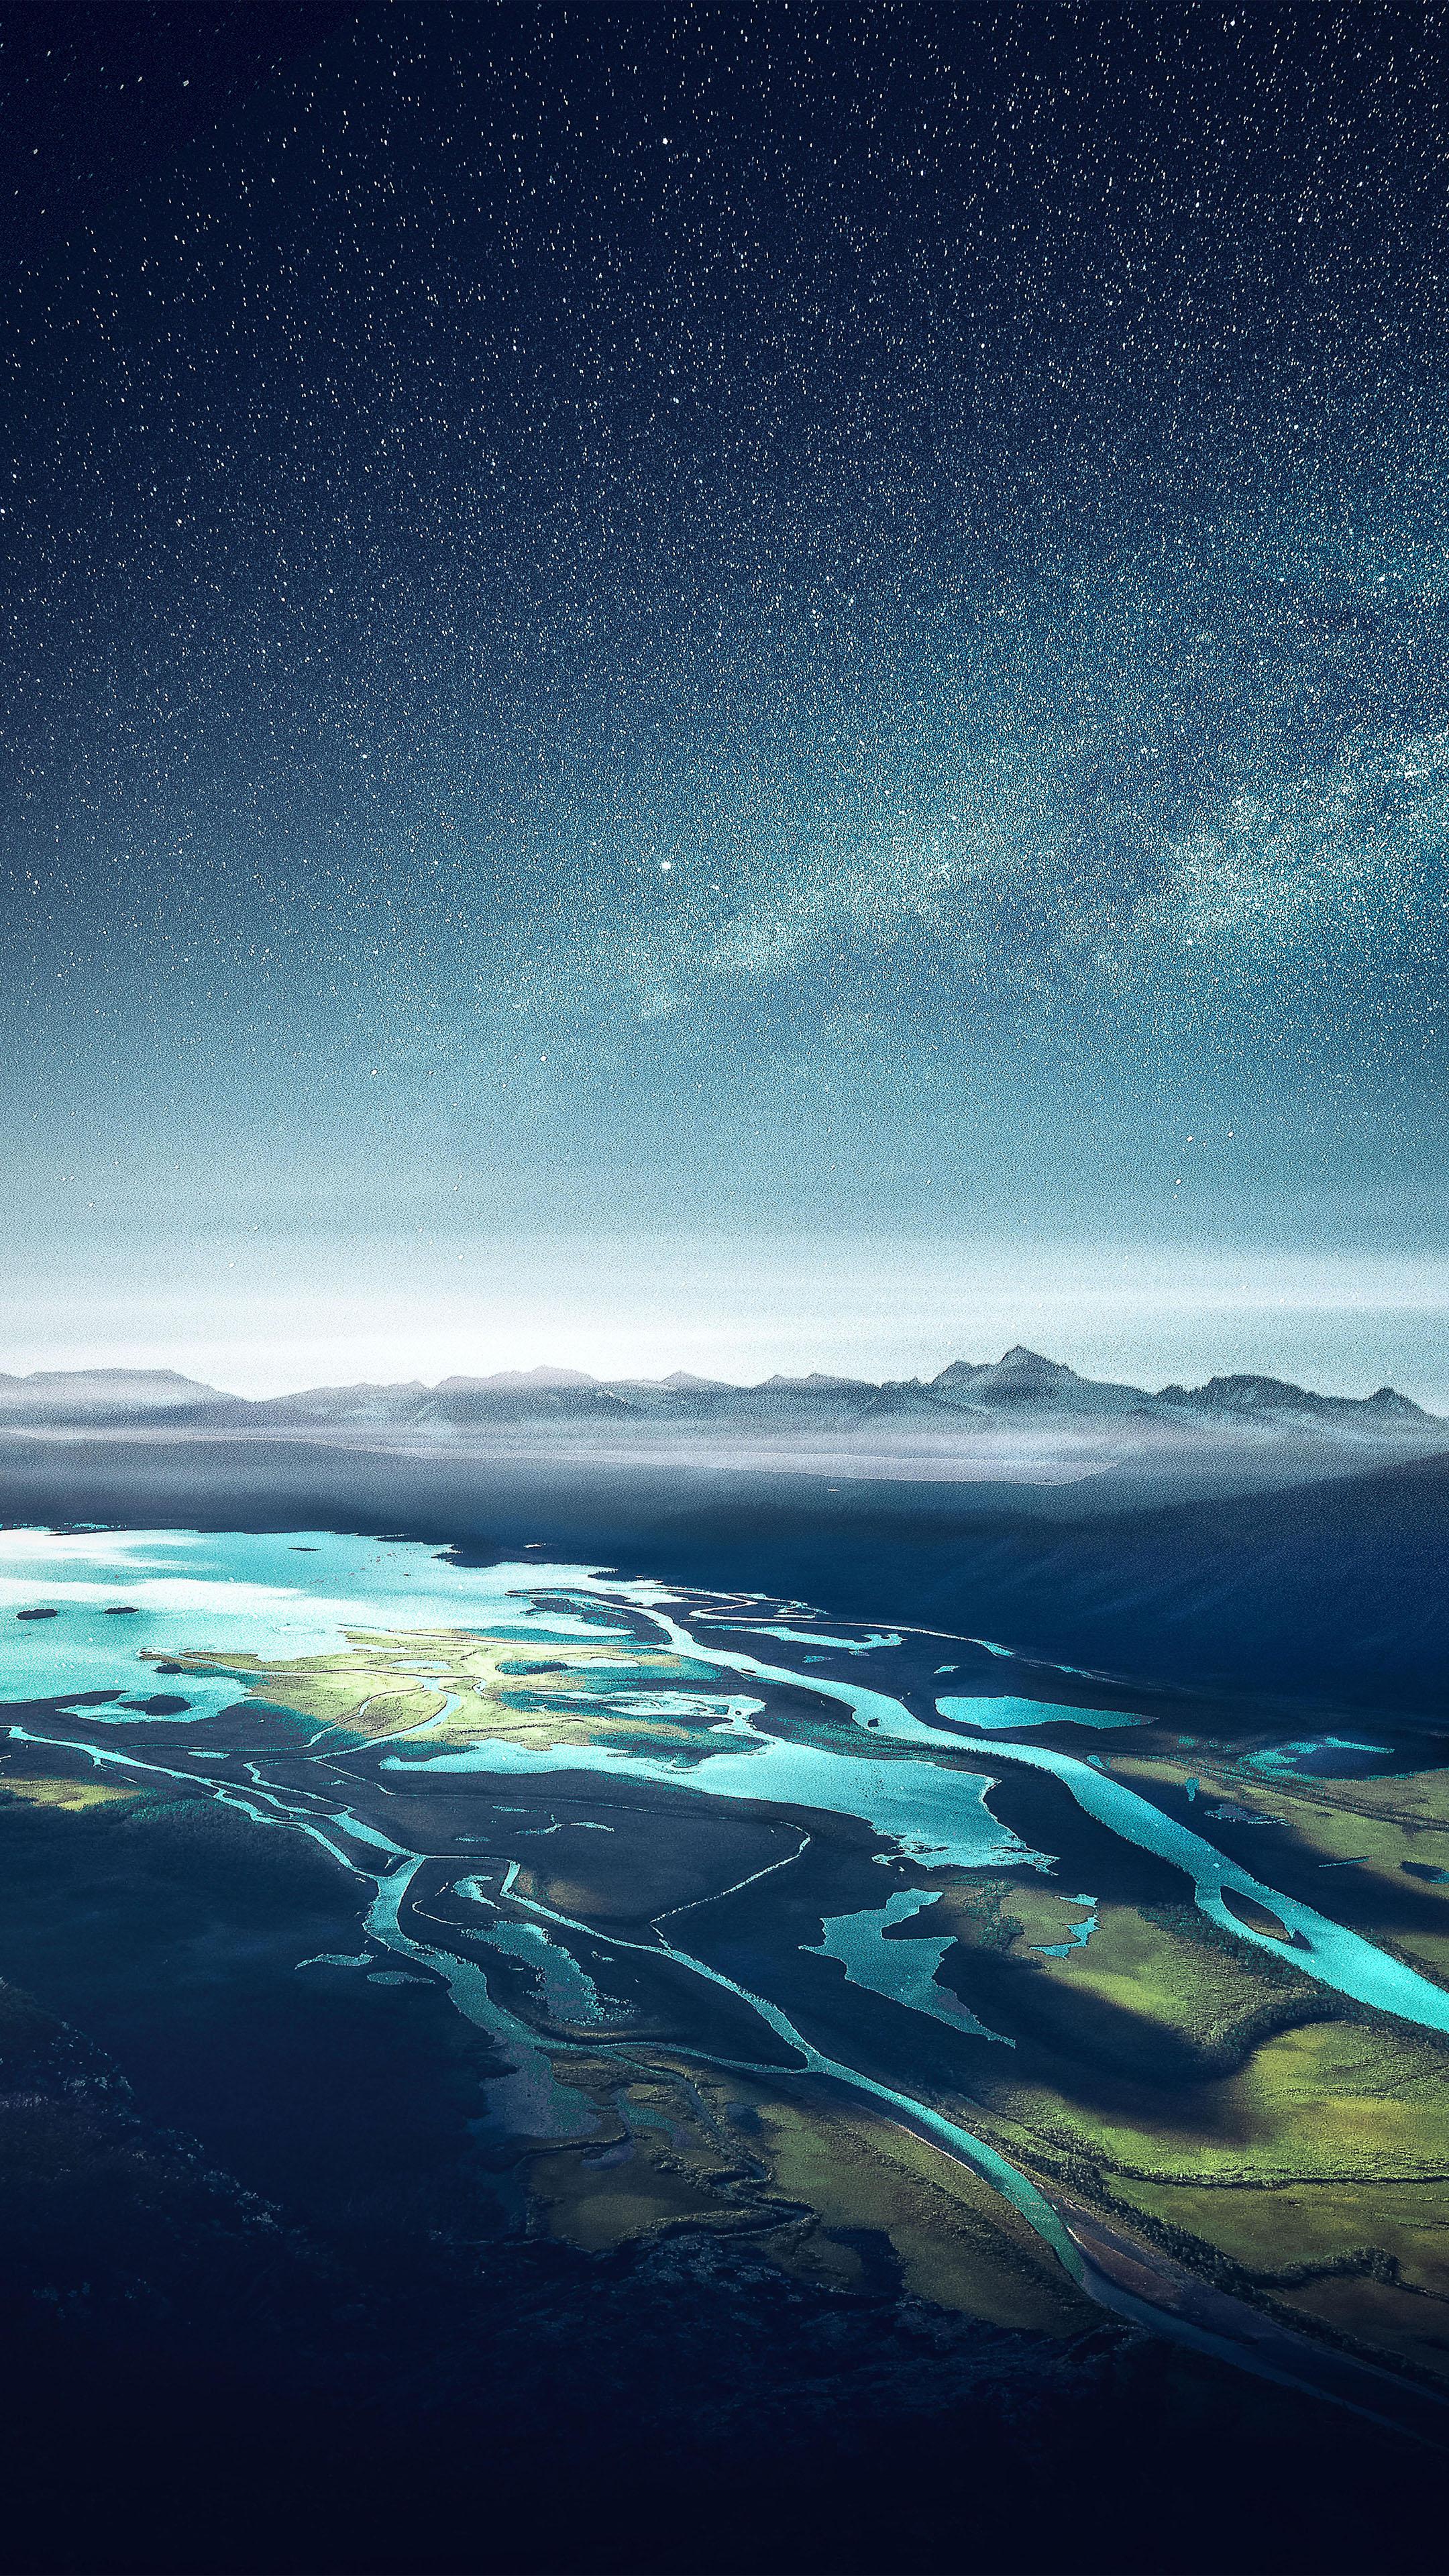 Download Mountain Range River Landscape Starry Sky Free